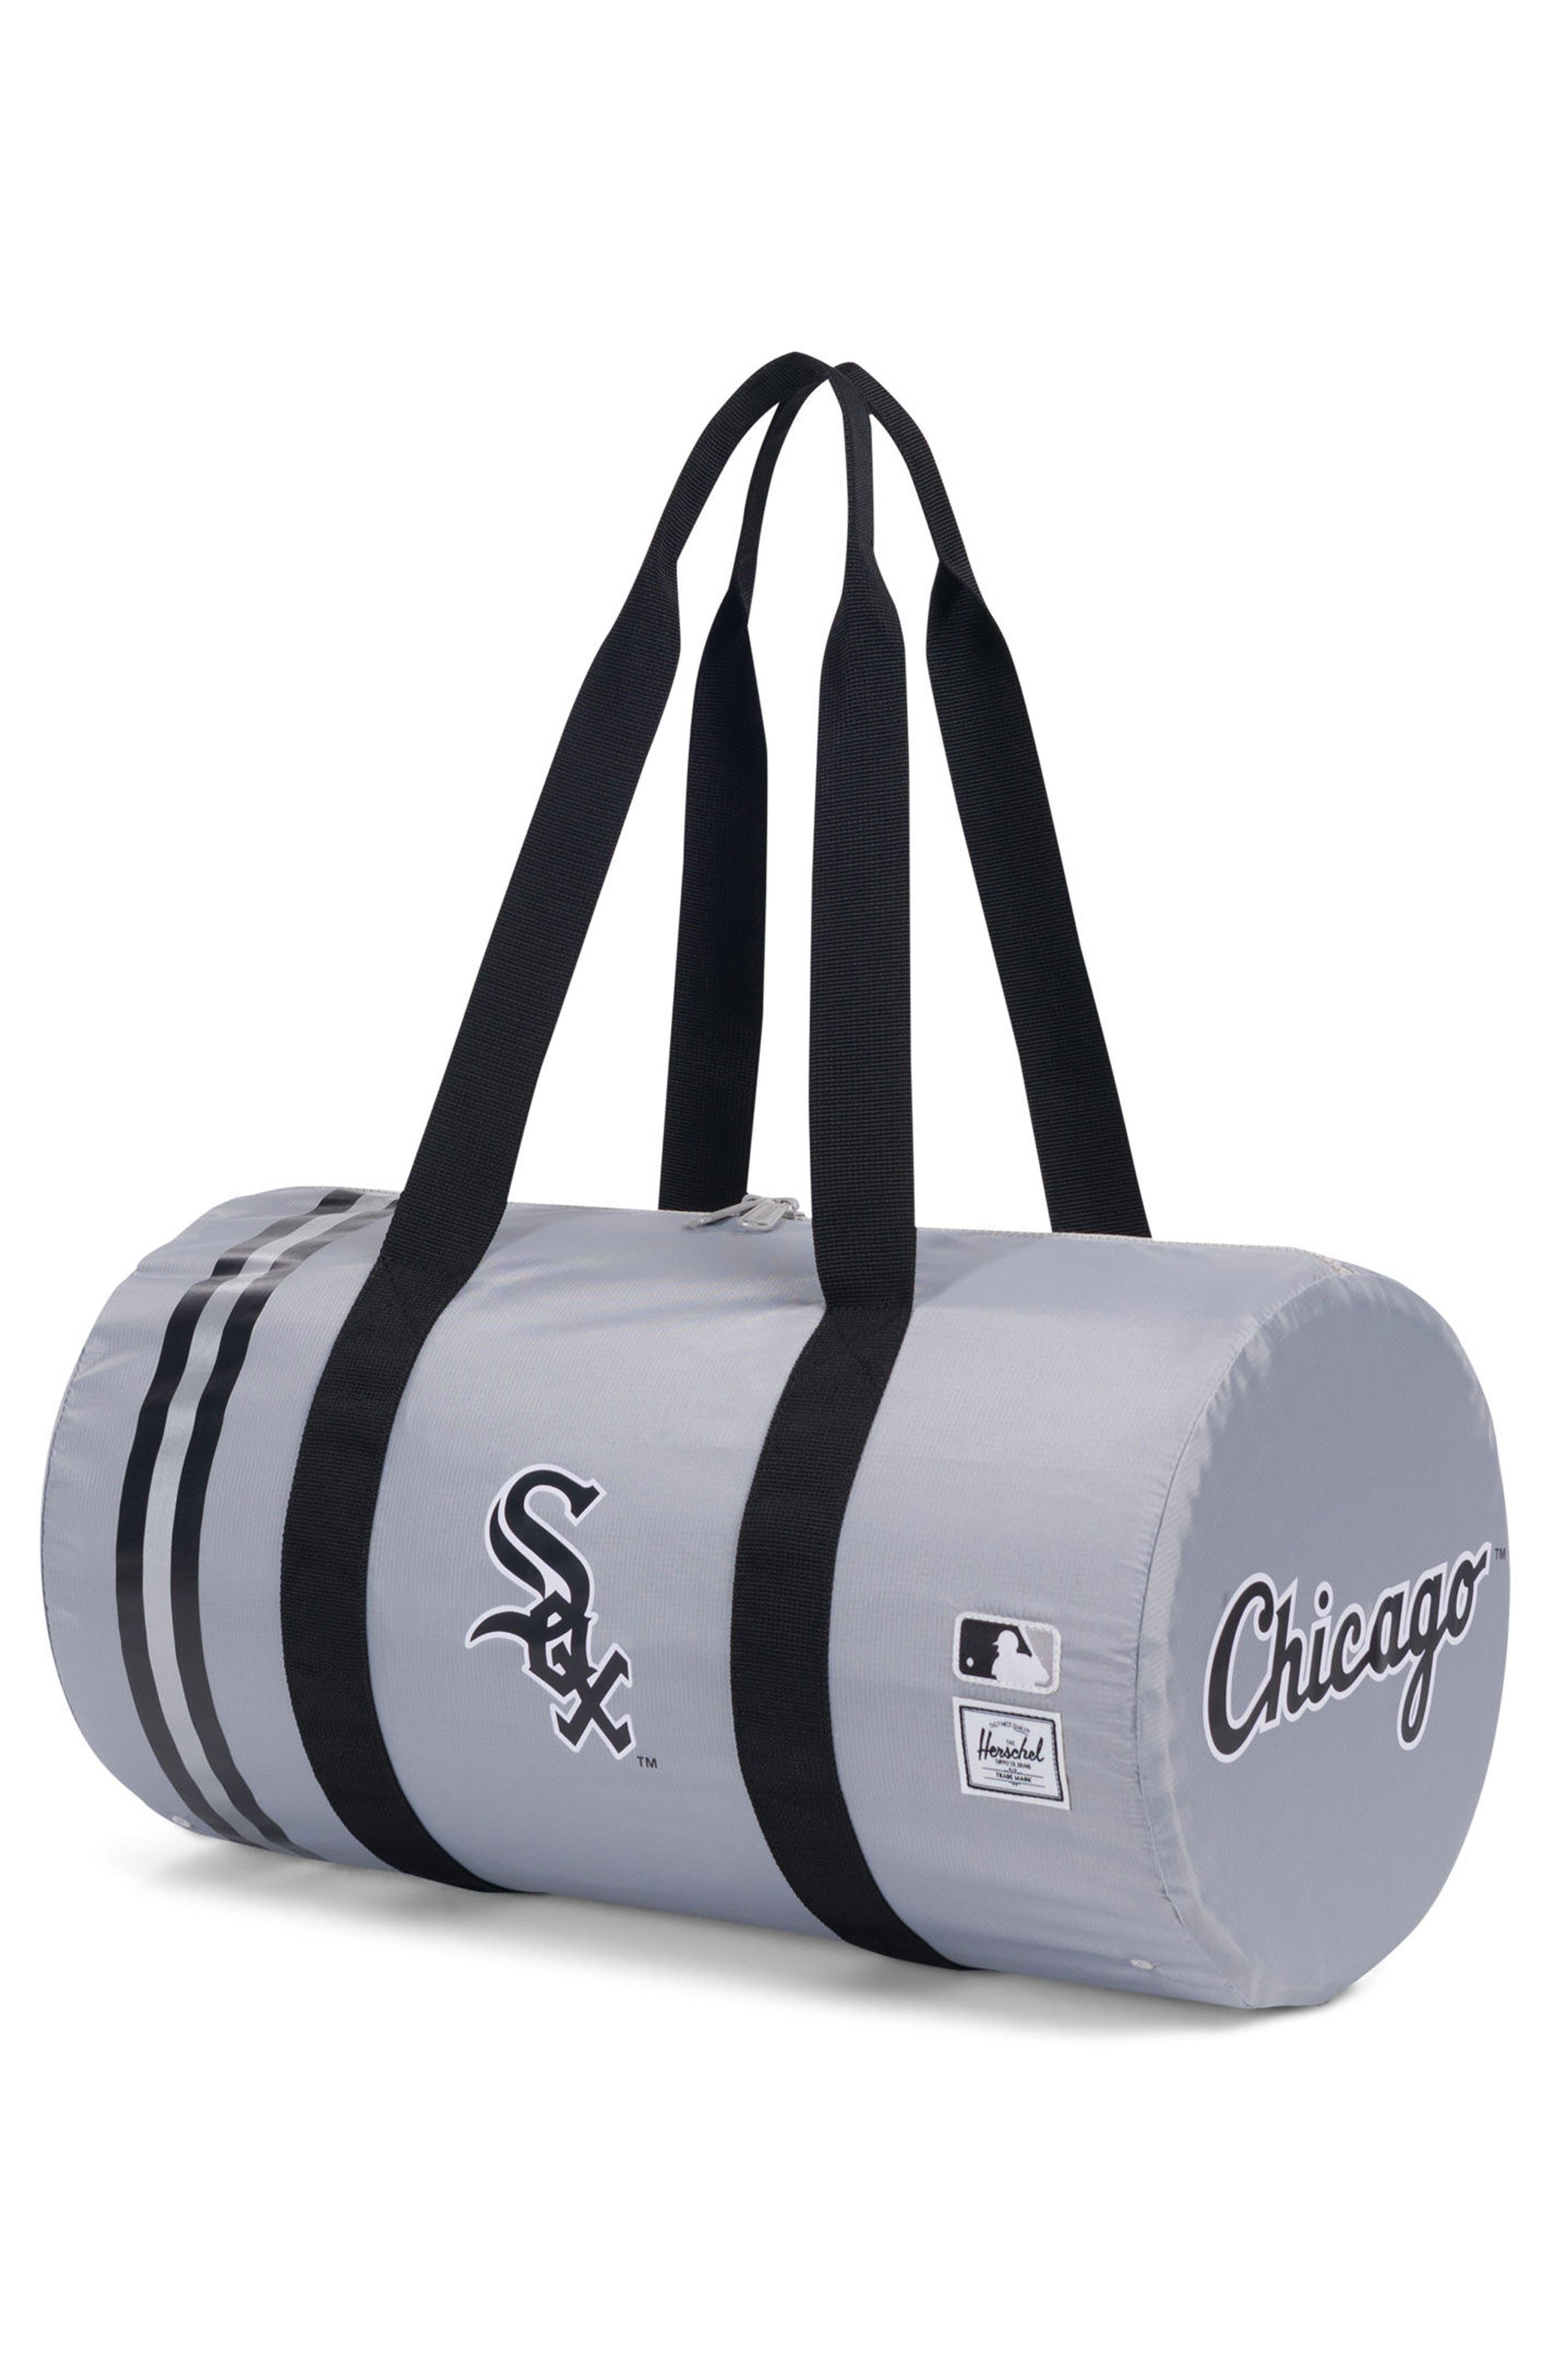 HERSCHEL SUPPLY CO.,                             Packable - MLB American League Duffel Bag,                             Alternate thumbnail 2, color,                             CHICAGO WHITE SOX